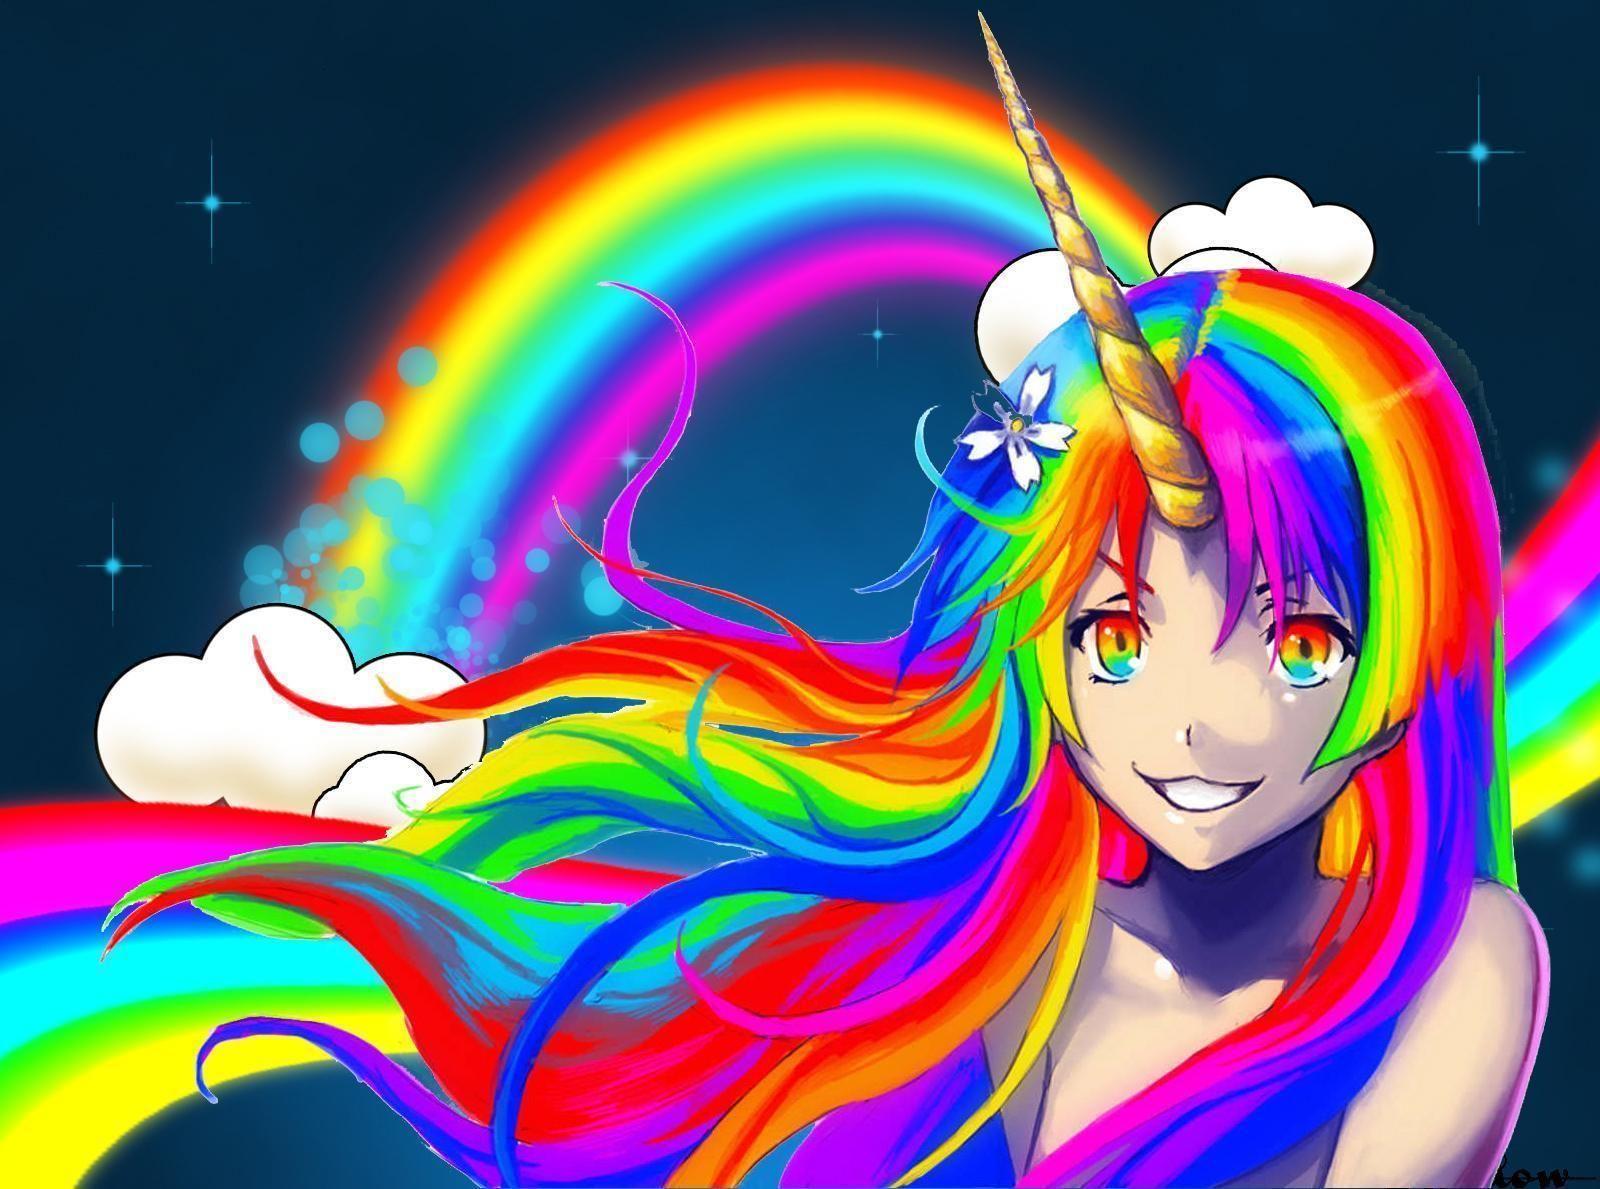 Anime, Colorful wallpaper, Wallpaper